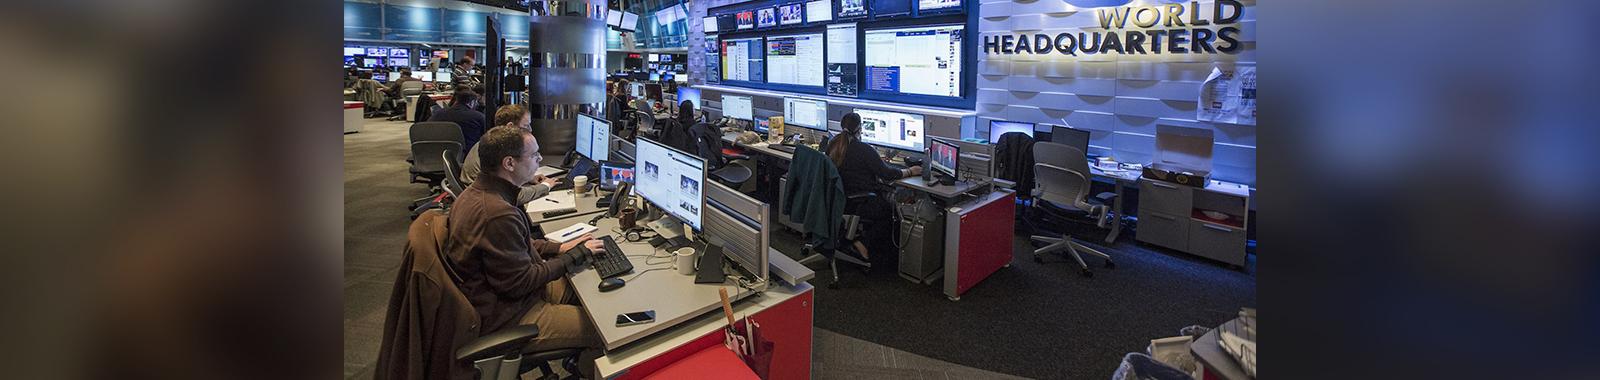 Images of the CNN War Room photographed on Friday, Jan. 8, 2016 in Atlanta, GA.  Photo by John Nowak/CNN